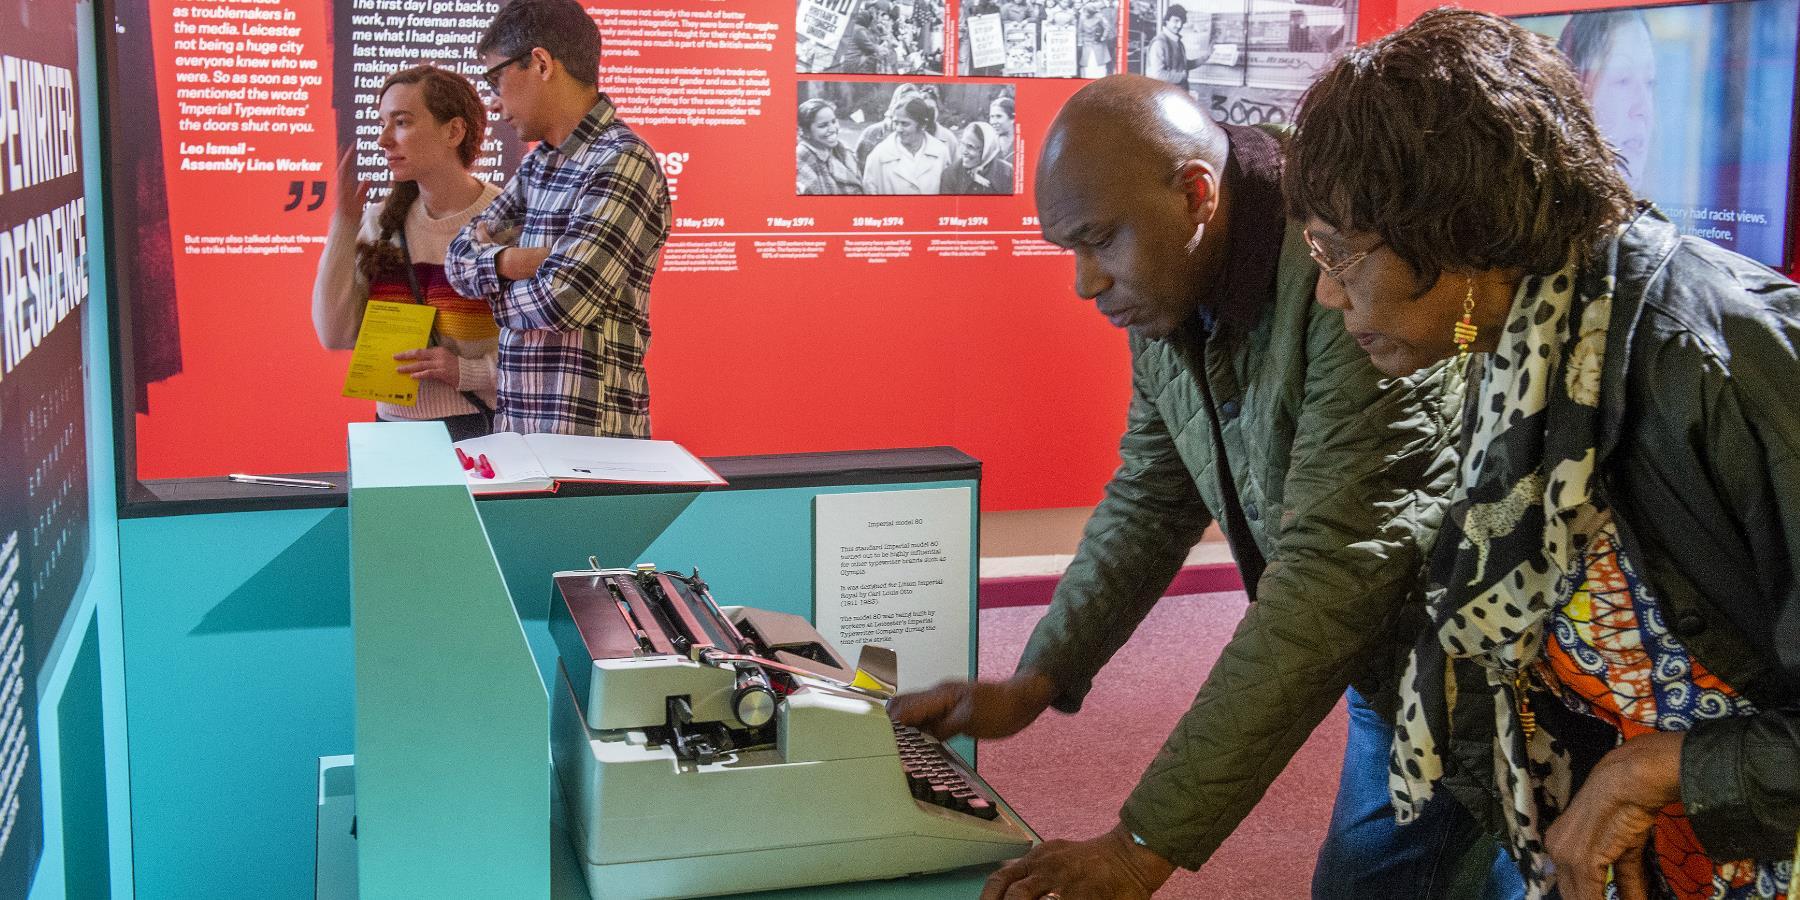 The Strike at Imperial Typewriters writer